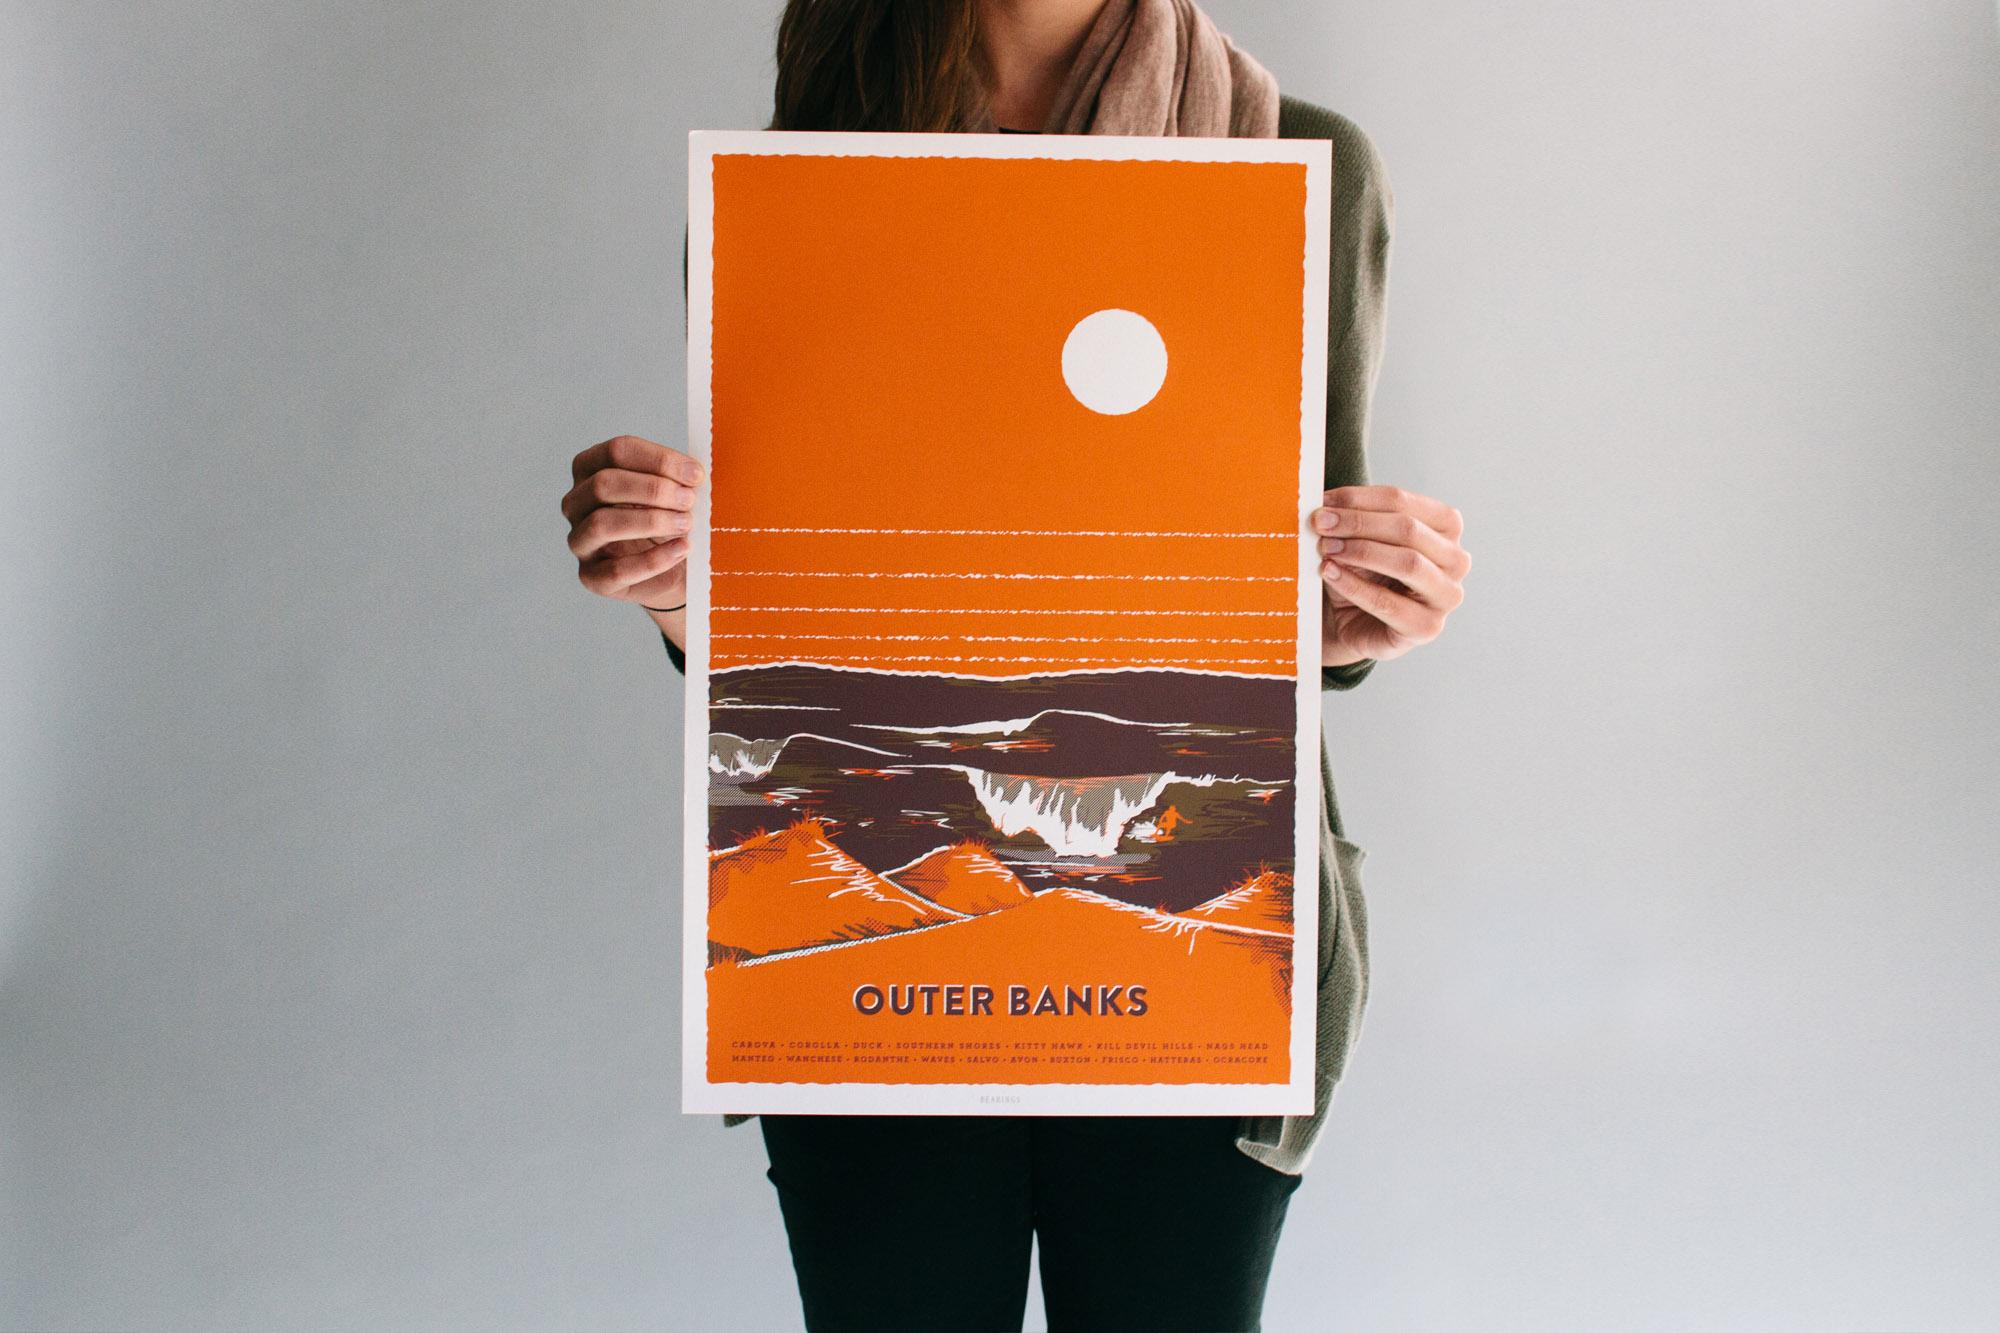 Orange Outer Banks bearings guide illustration